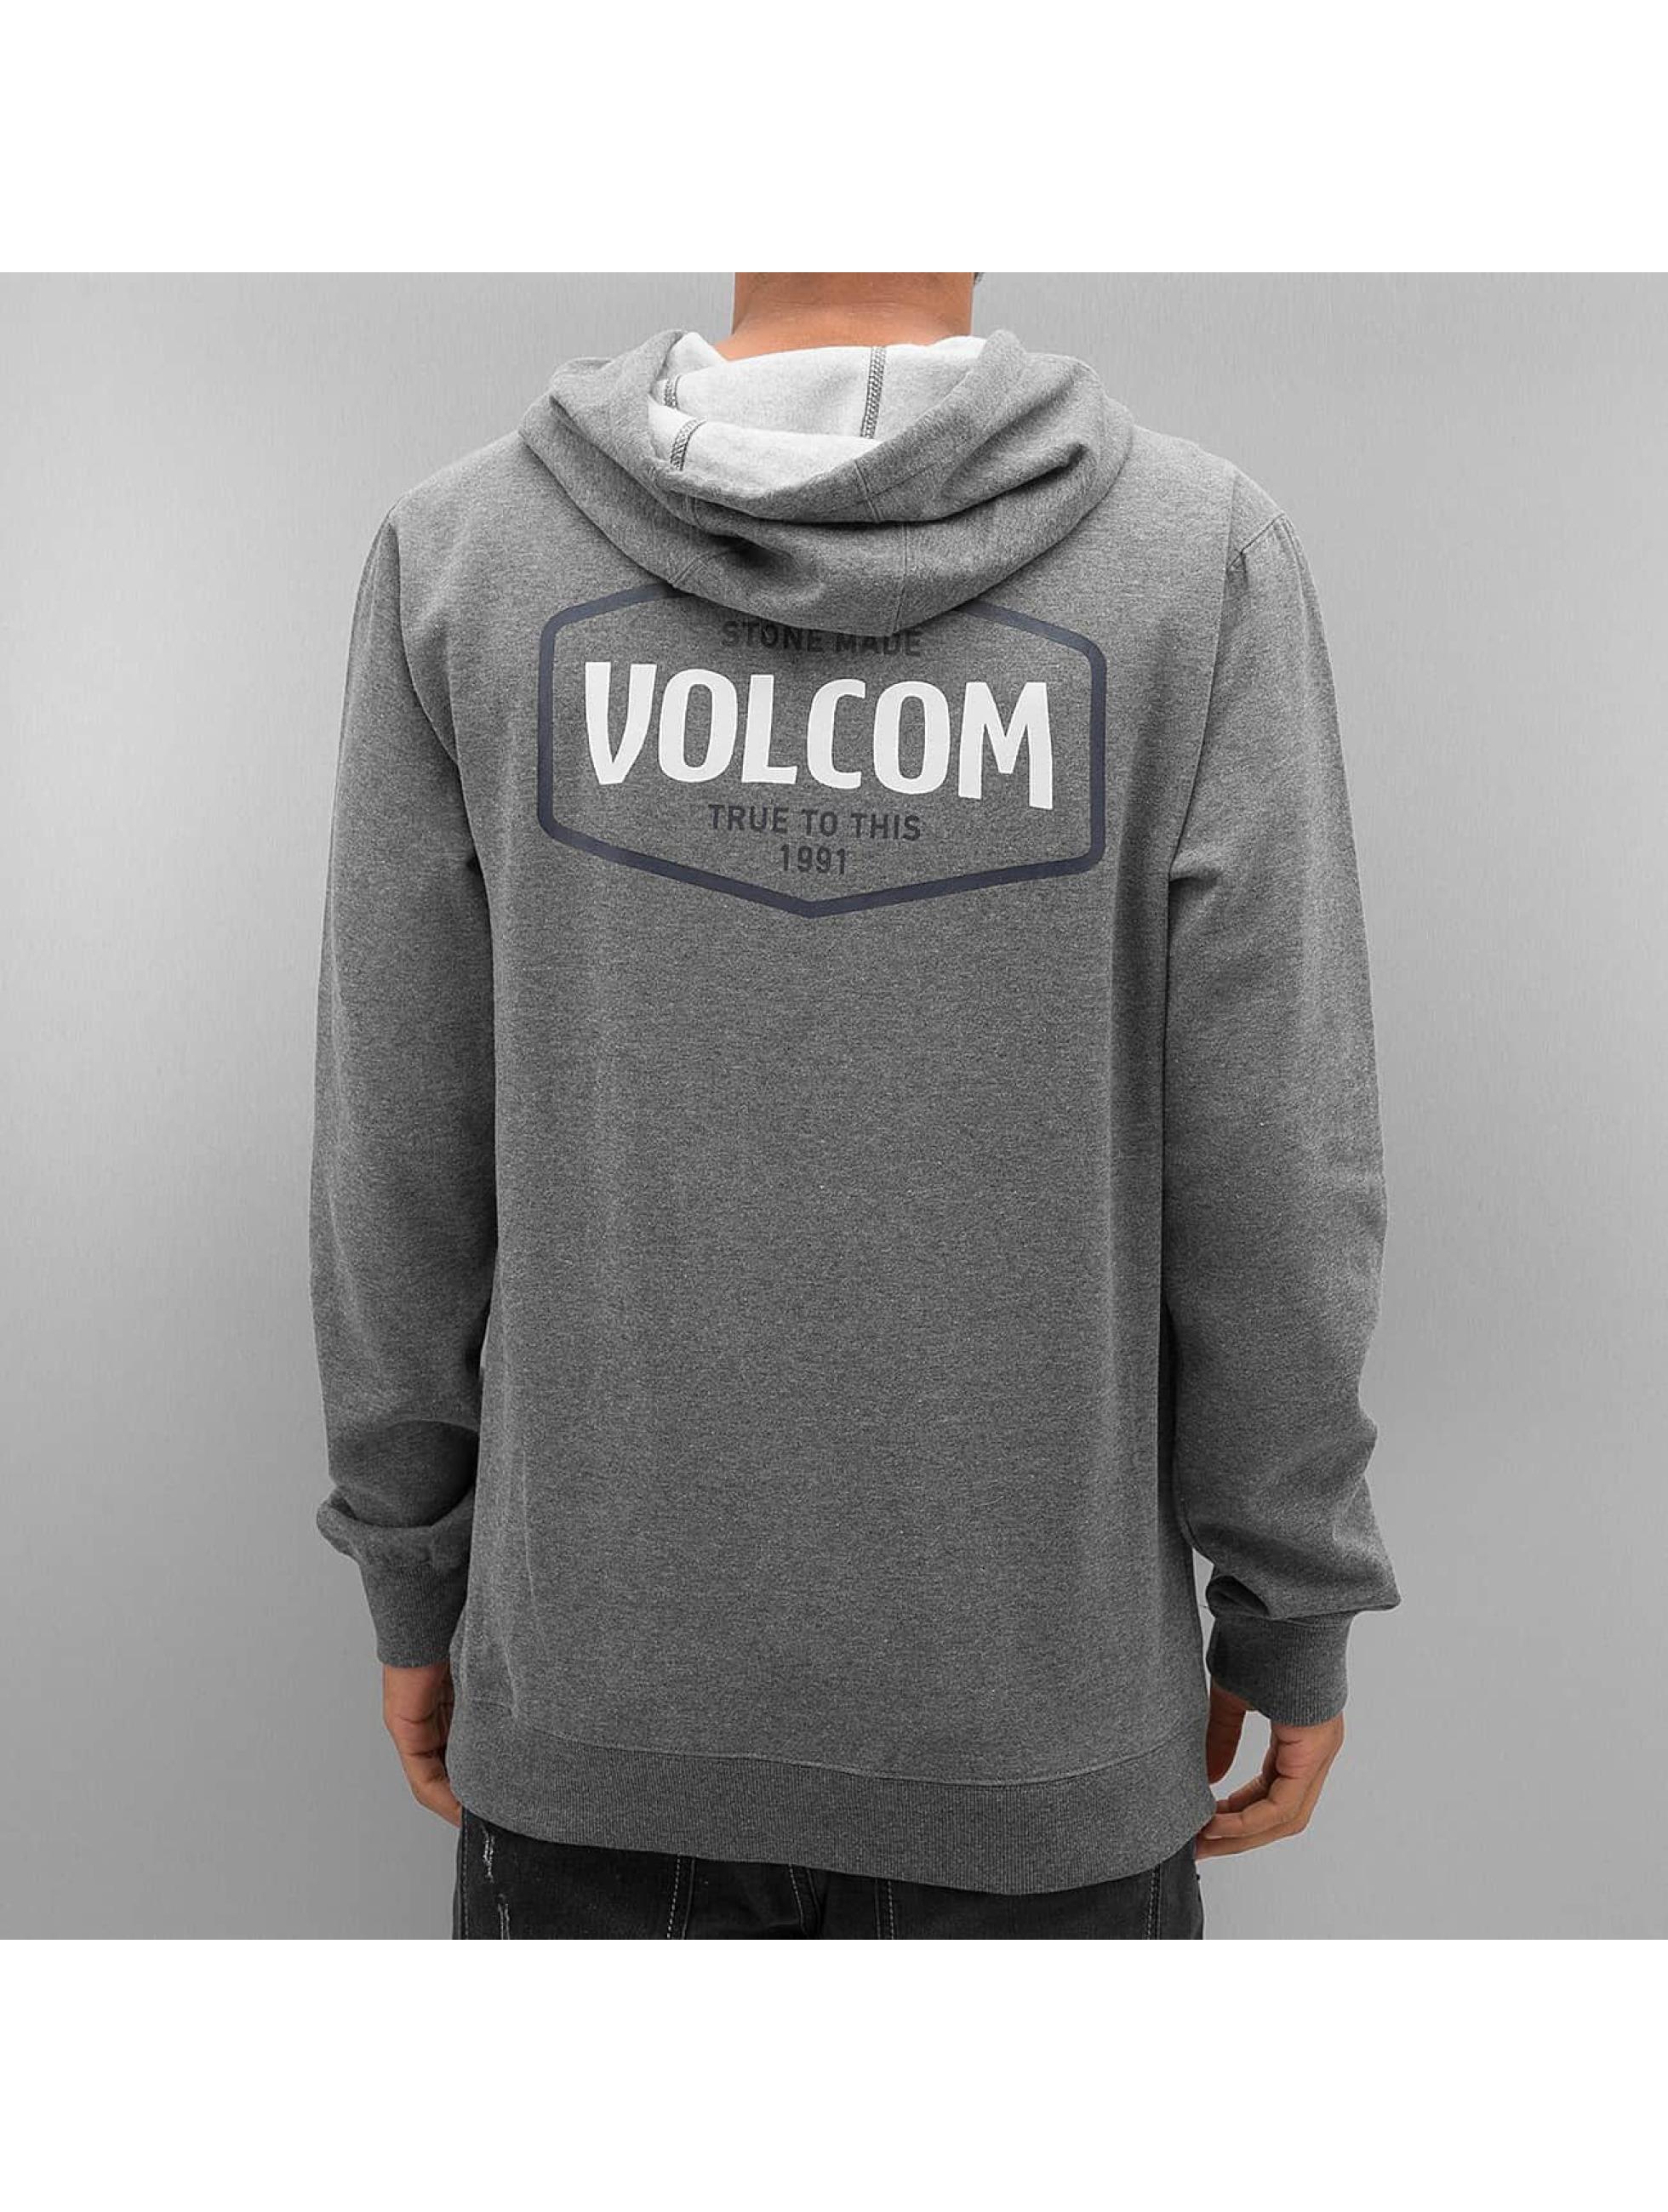 Volcom Hoody Packsaddle grau